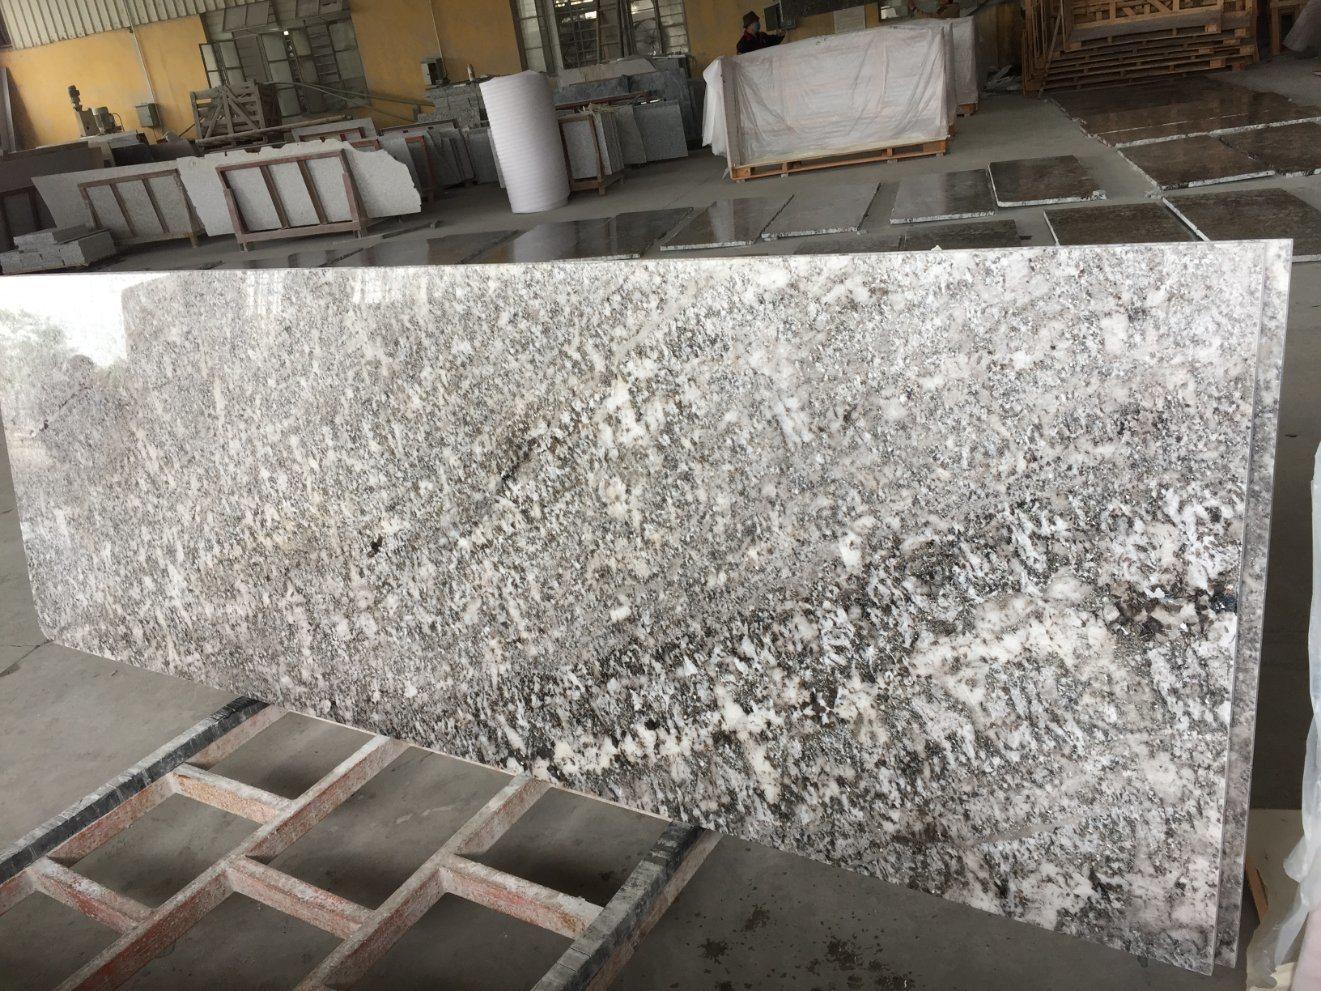 Bianco Antico White Granite Prefab Countertops For Interior Construction Projects China Granite Countertop Bath Vanity Made In China Com